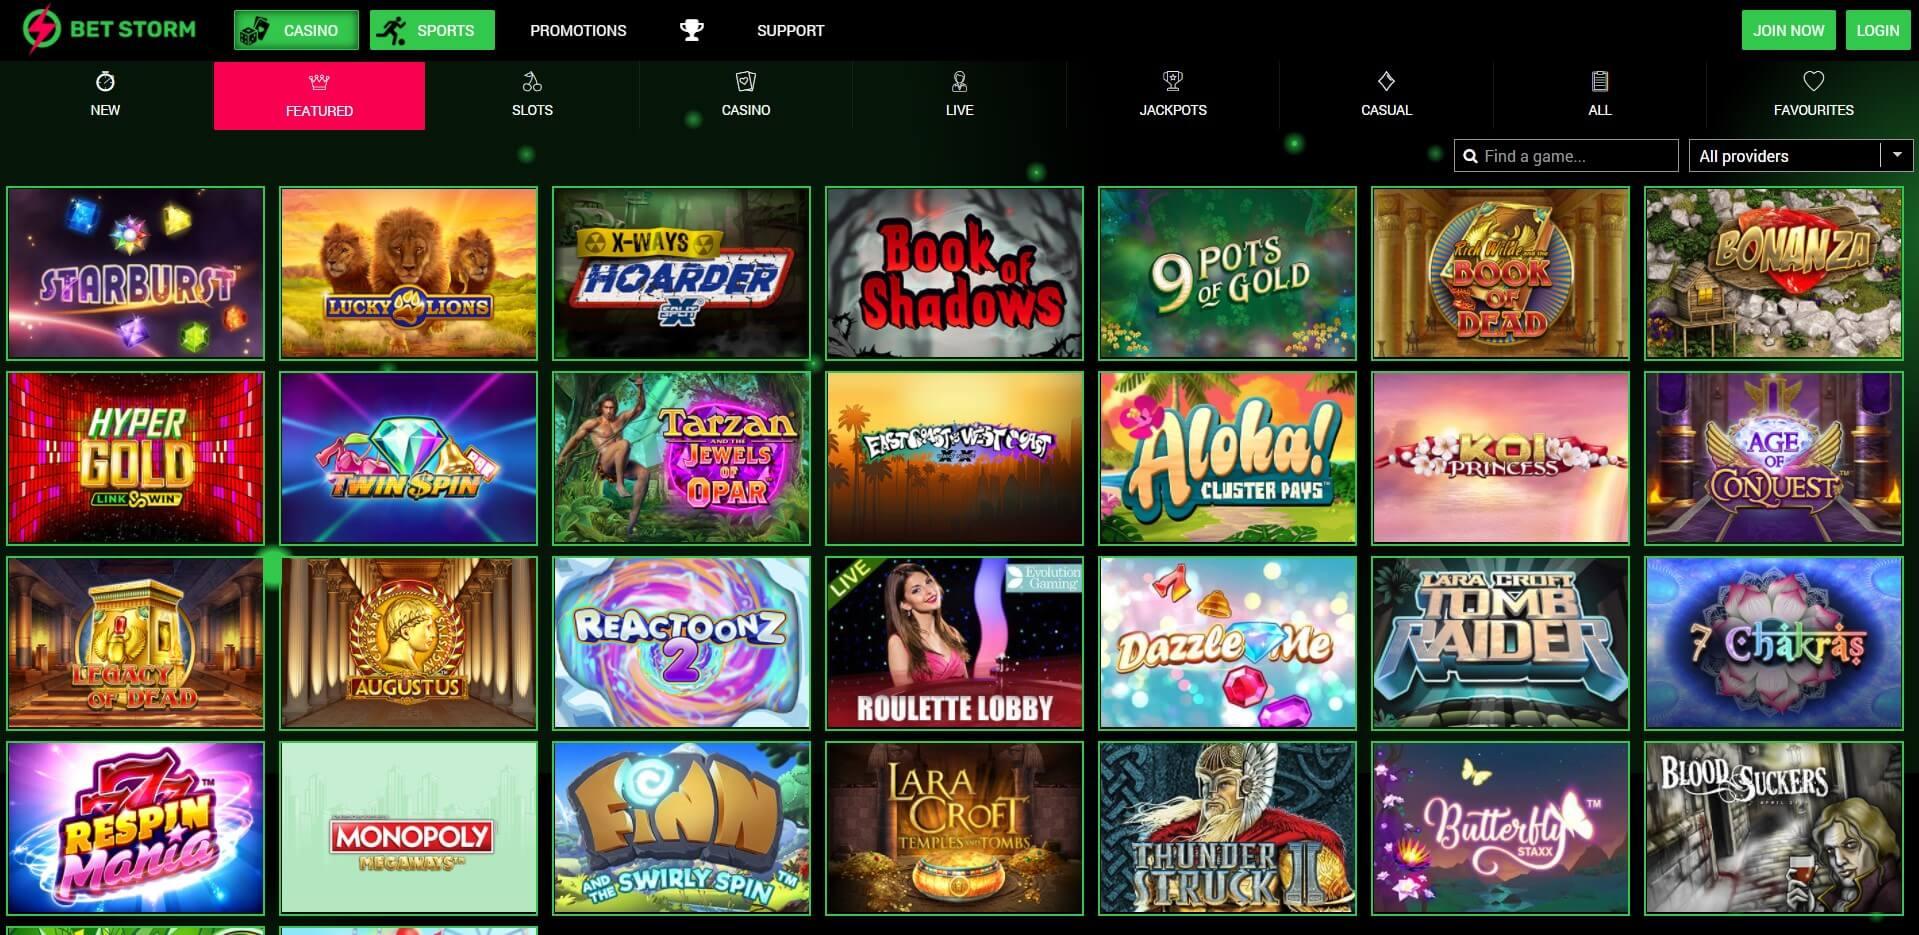 Games at BetStorm Casino